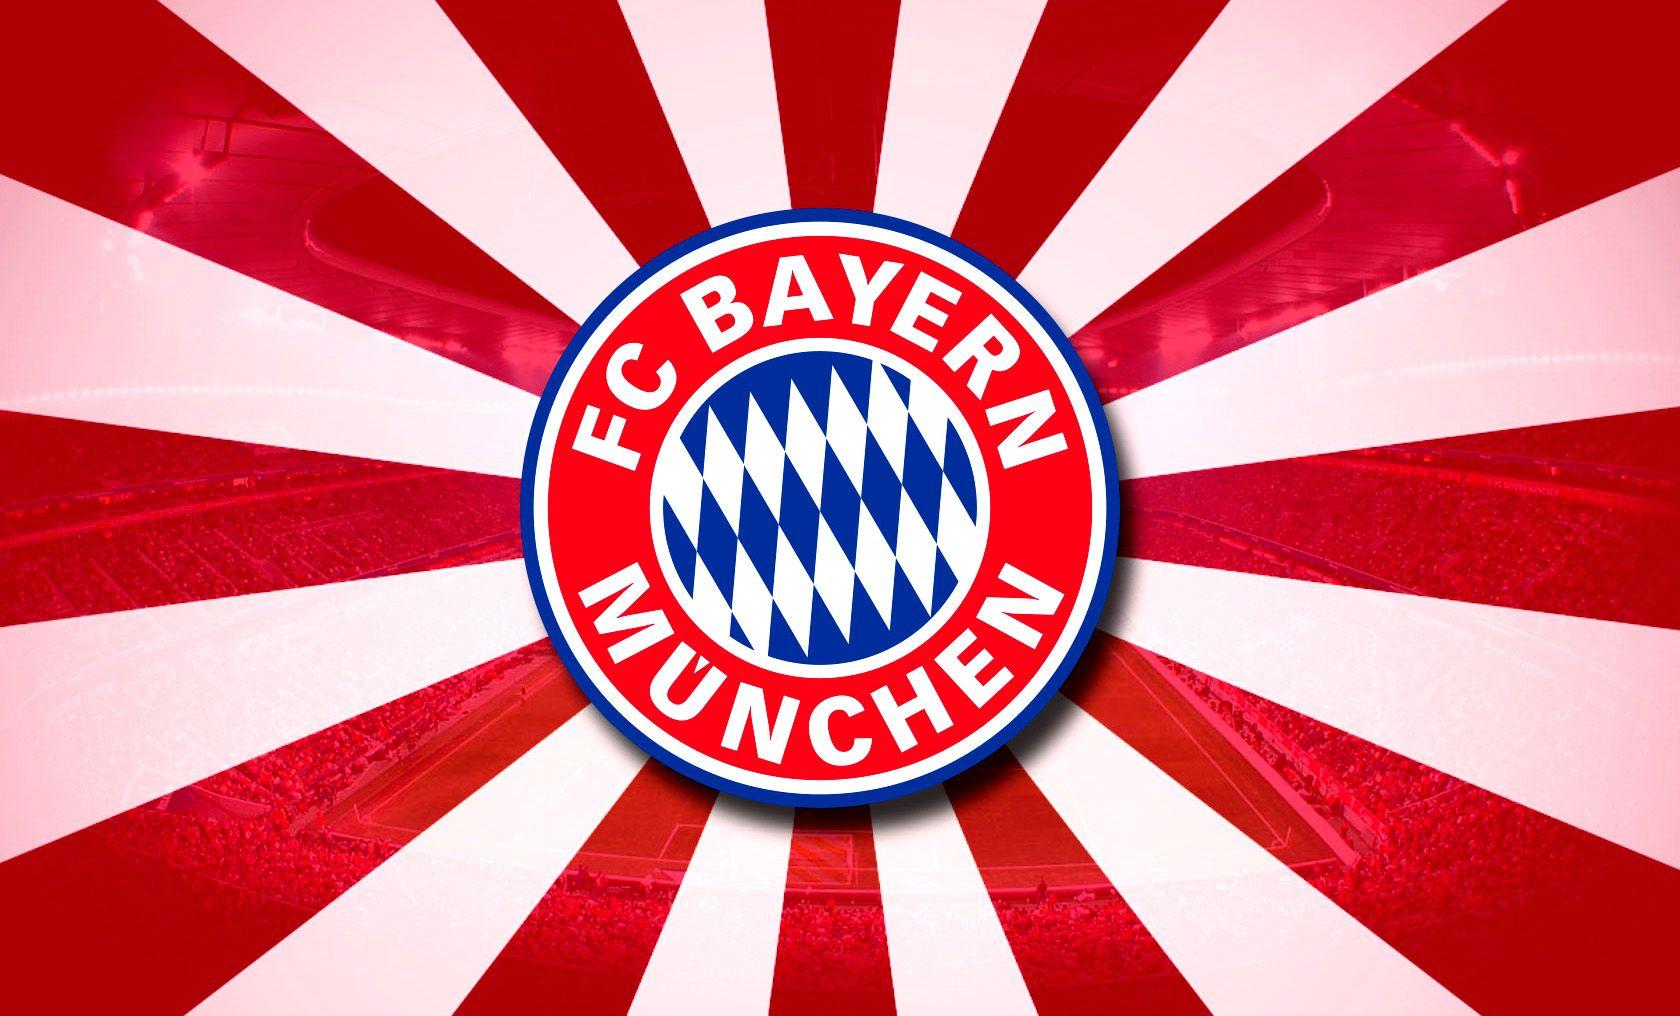 Cool Bayern Munchen Latest Wallpaper Images Picture Gallery Bayern Munich Bayern Bayern Munich Wallpapers